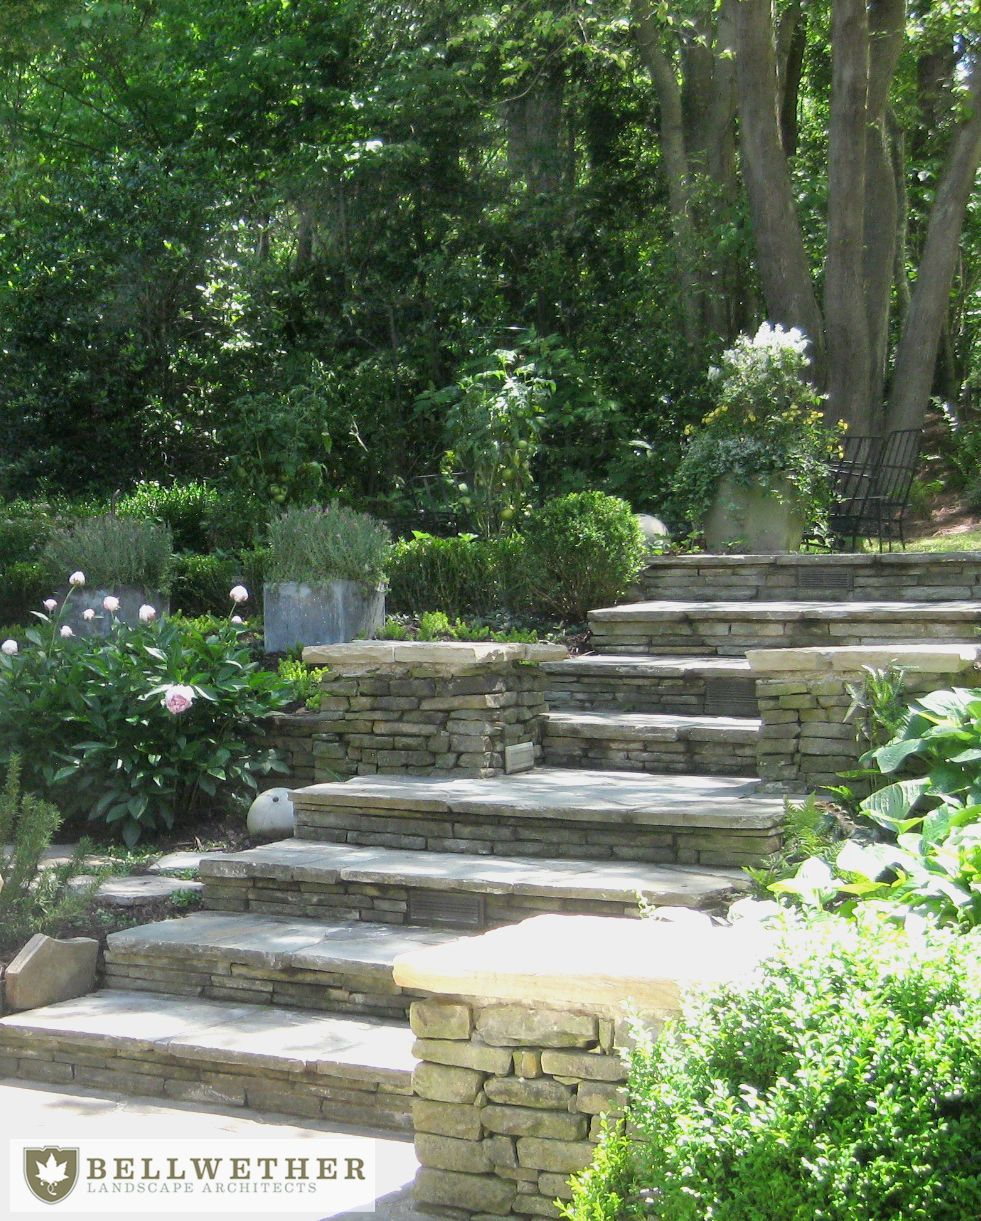 Landscape architect atlanta ga - Bellwether Landscape Architects In Atlanta Ga